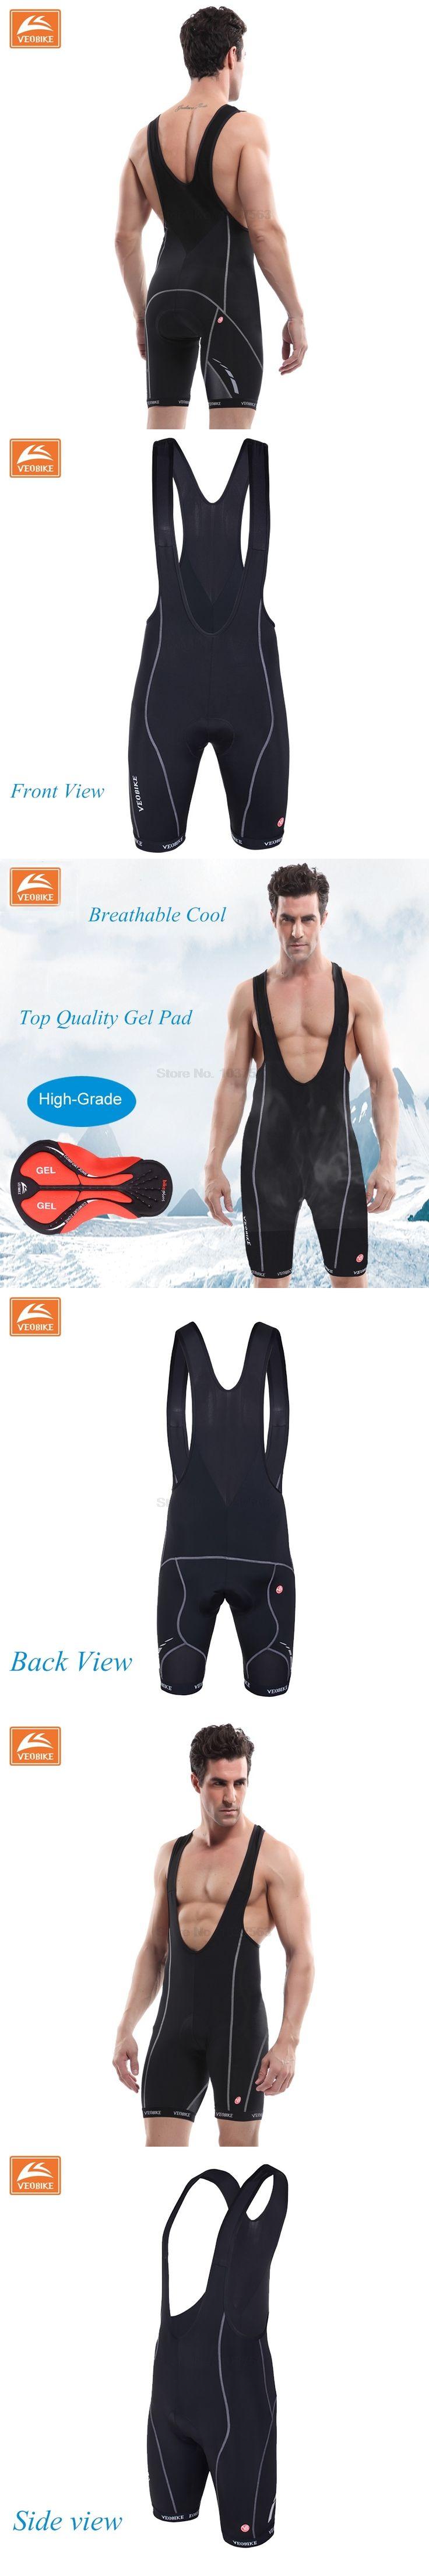 VEOBIKE Pro Team Ropa Ciclismo Men's Cycling Bib Shorts Pants Bicycle Bike Vest Shorts Clothing 3D Cushion Gel Pad Braces Tights